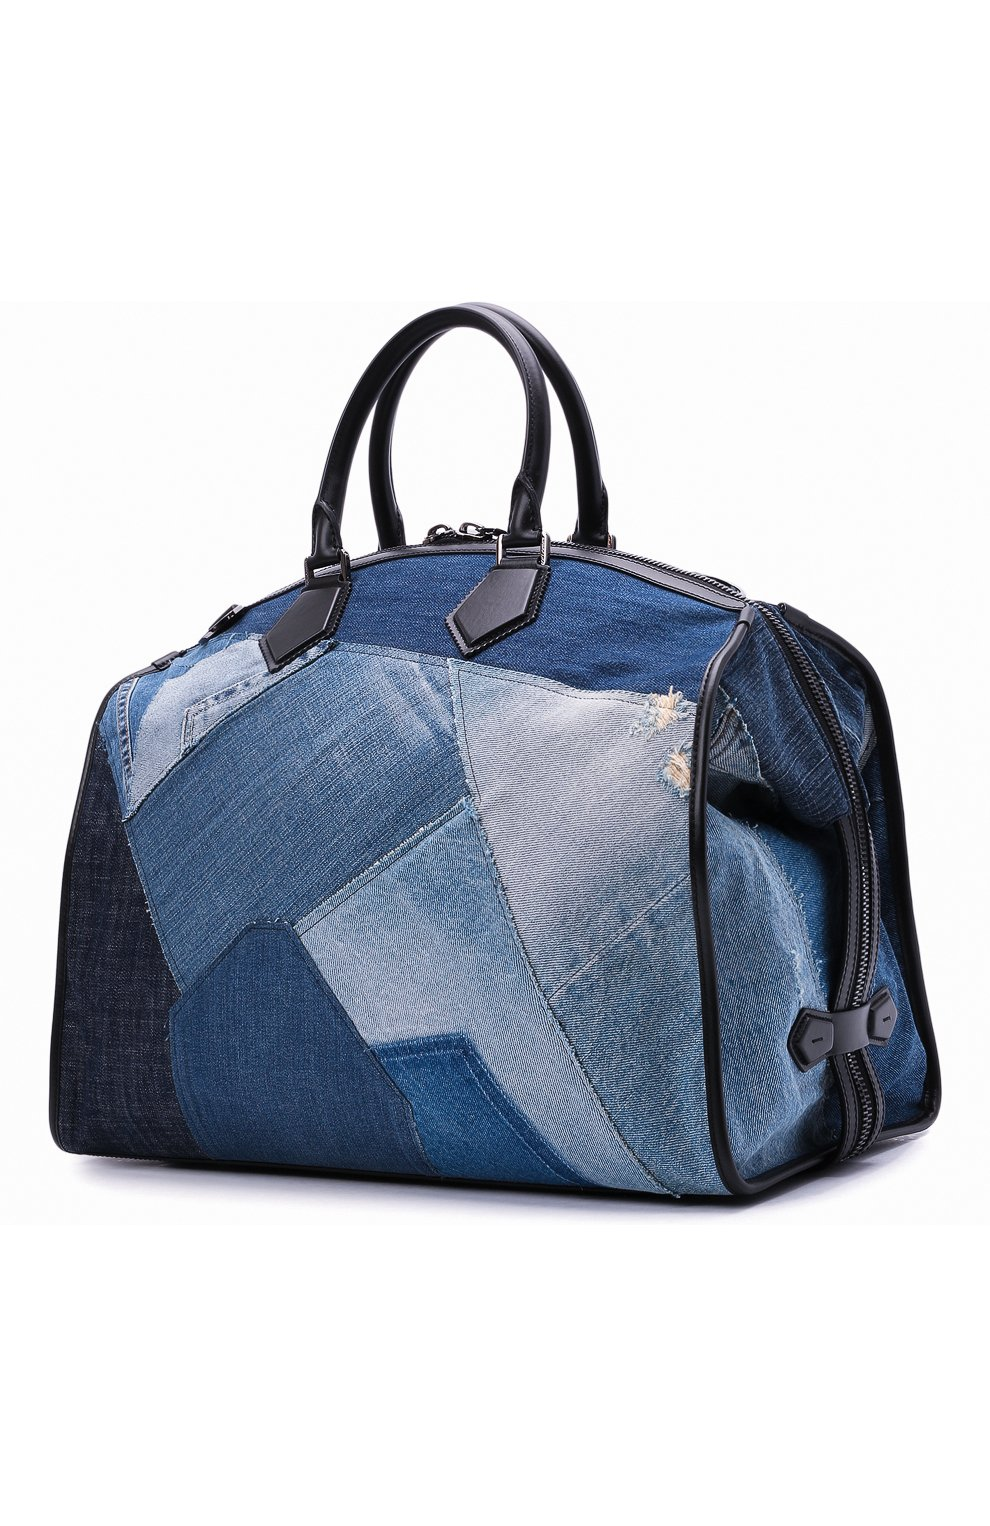 Мужская текстильная дорожная сумка edge DOLCE & GABBANA синего цвета, арт. BM1789/AW347 | Фото 3